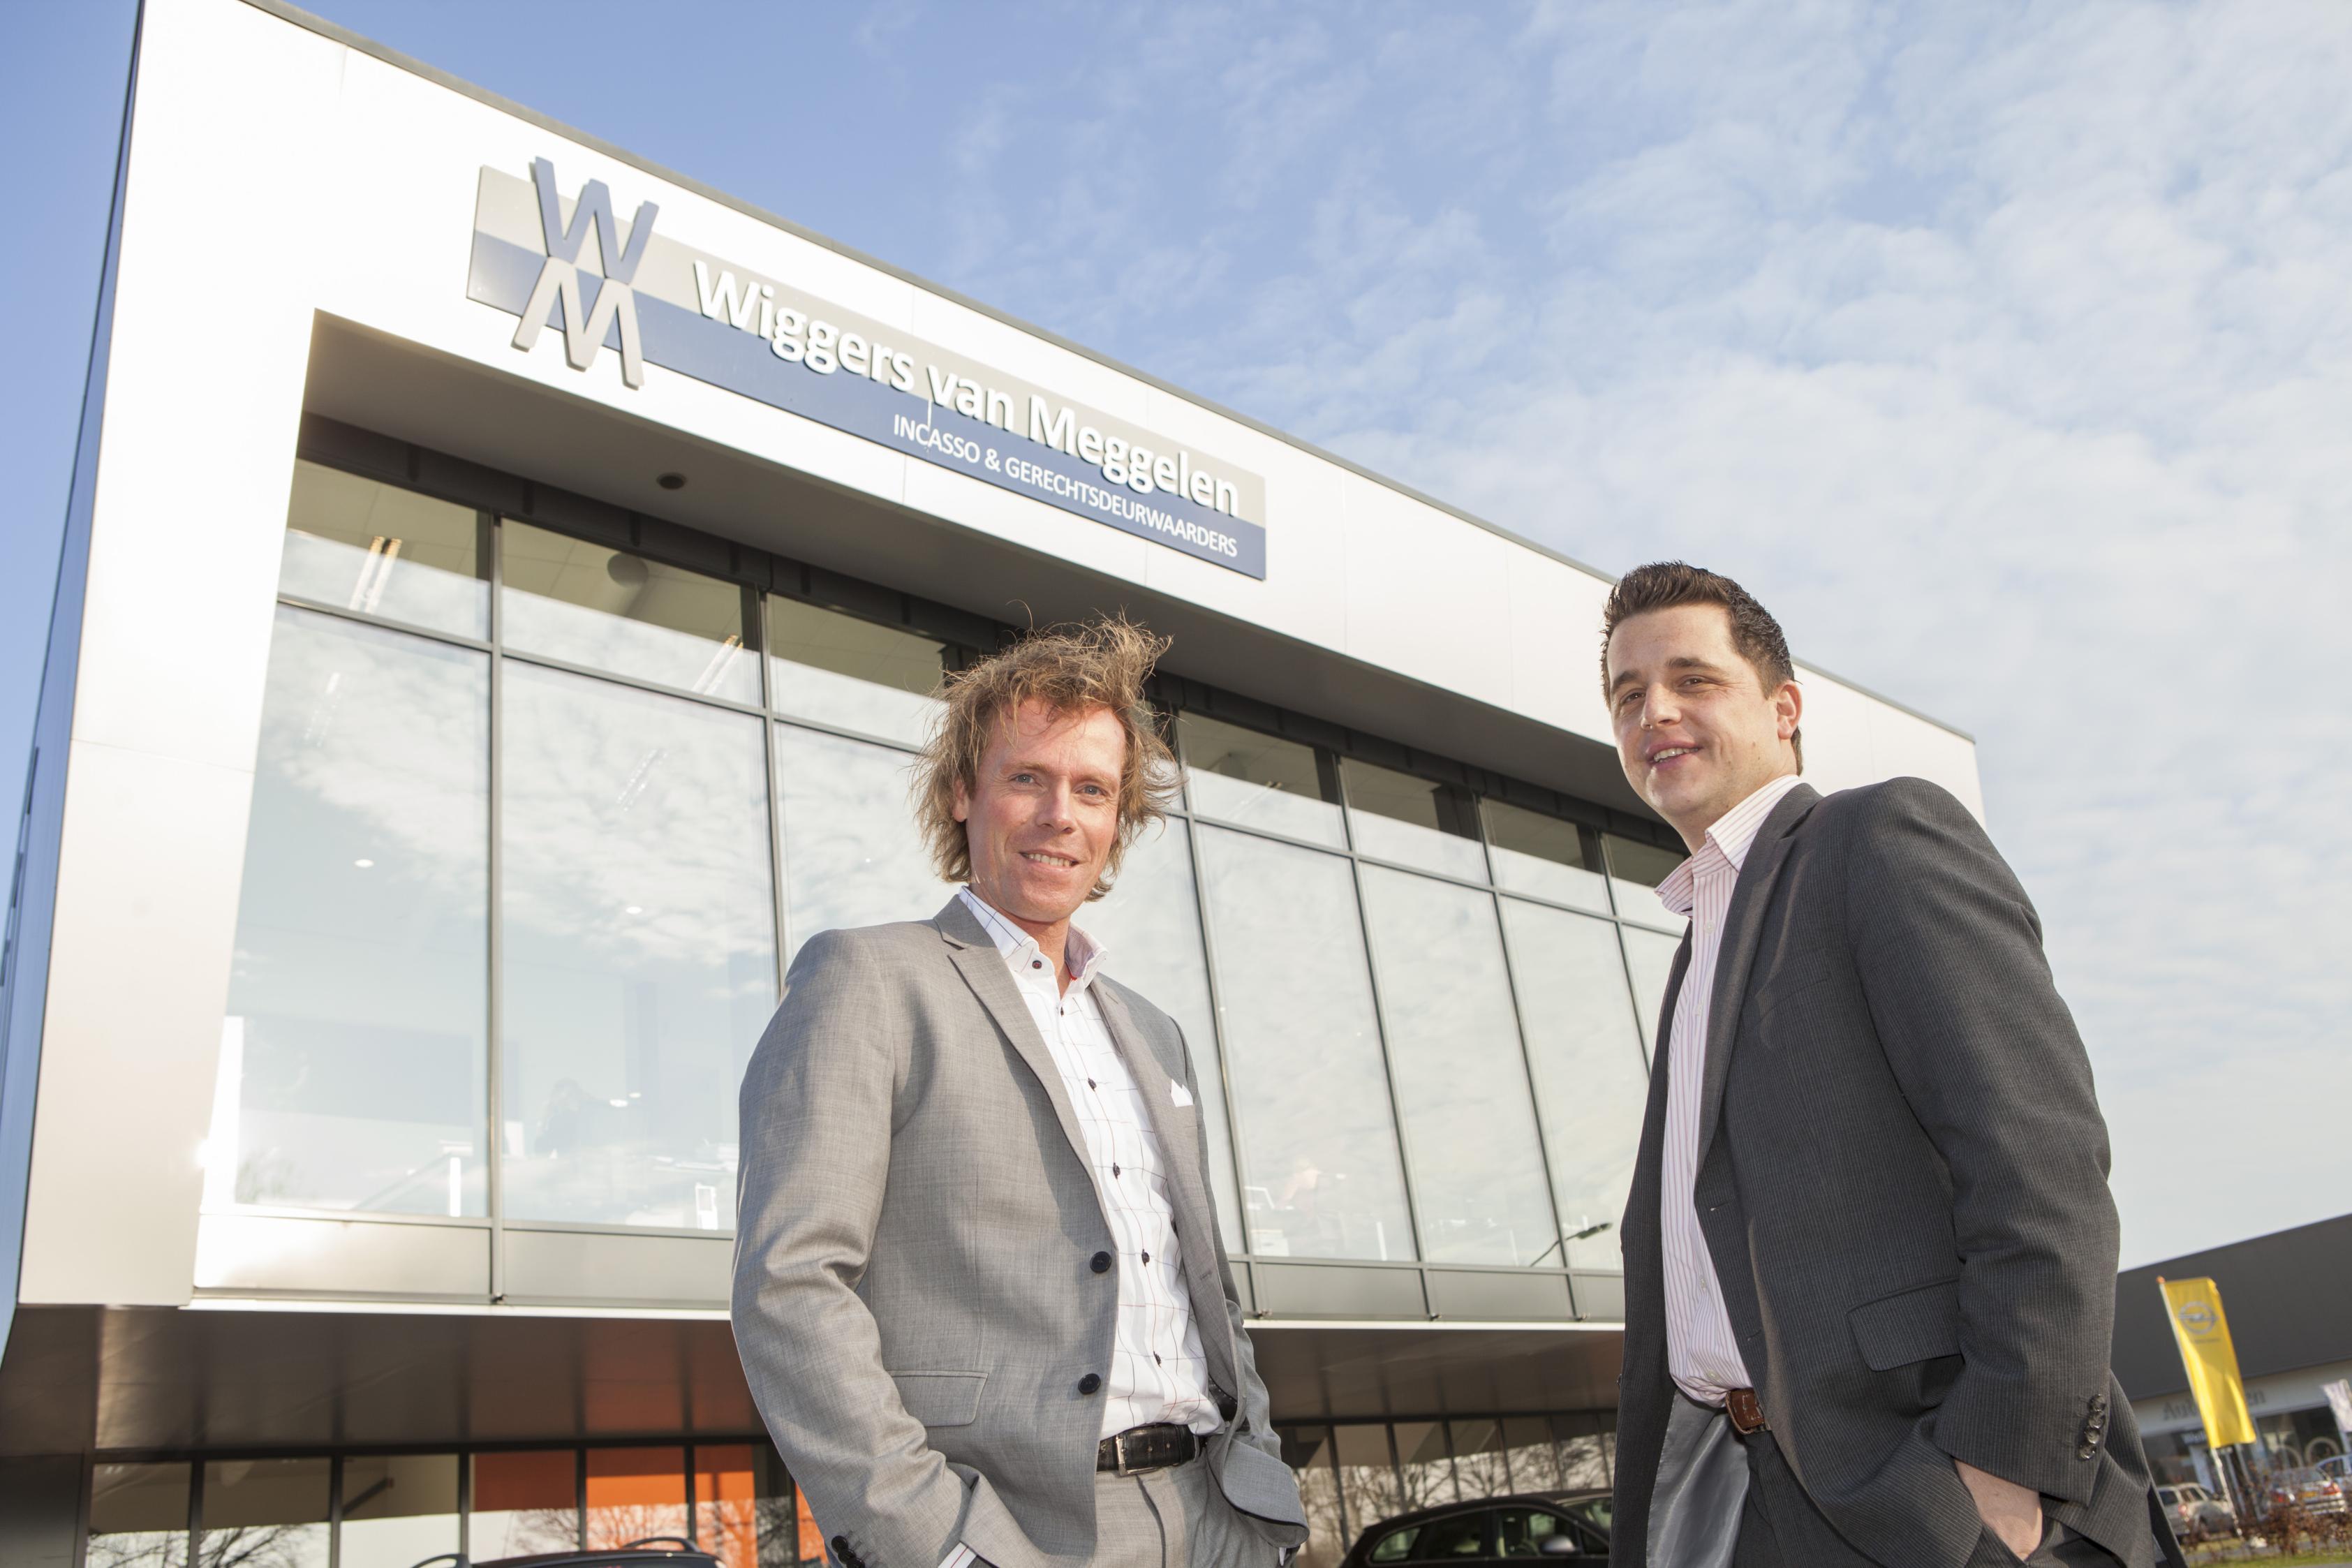 Wiggers van Meggelen incassobureau Zutphen